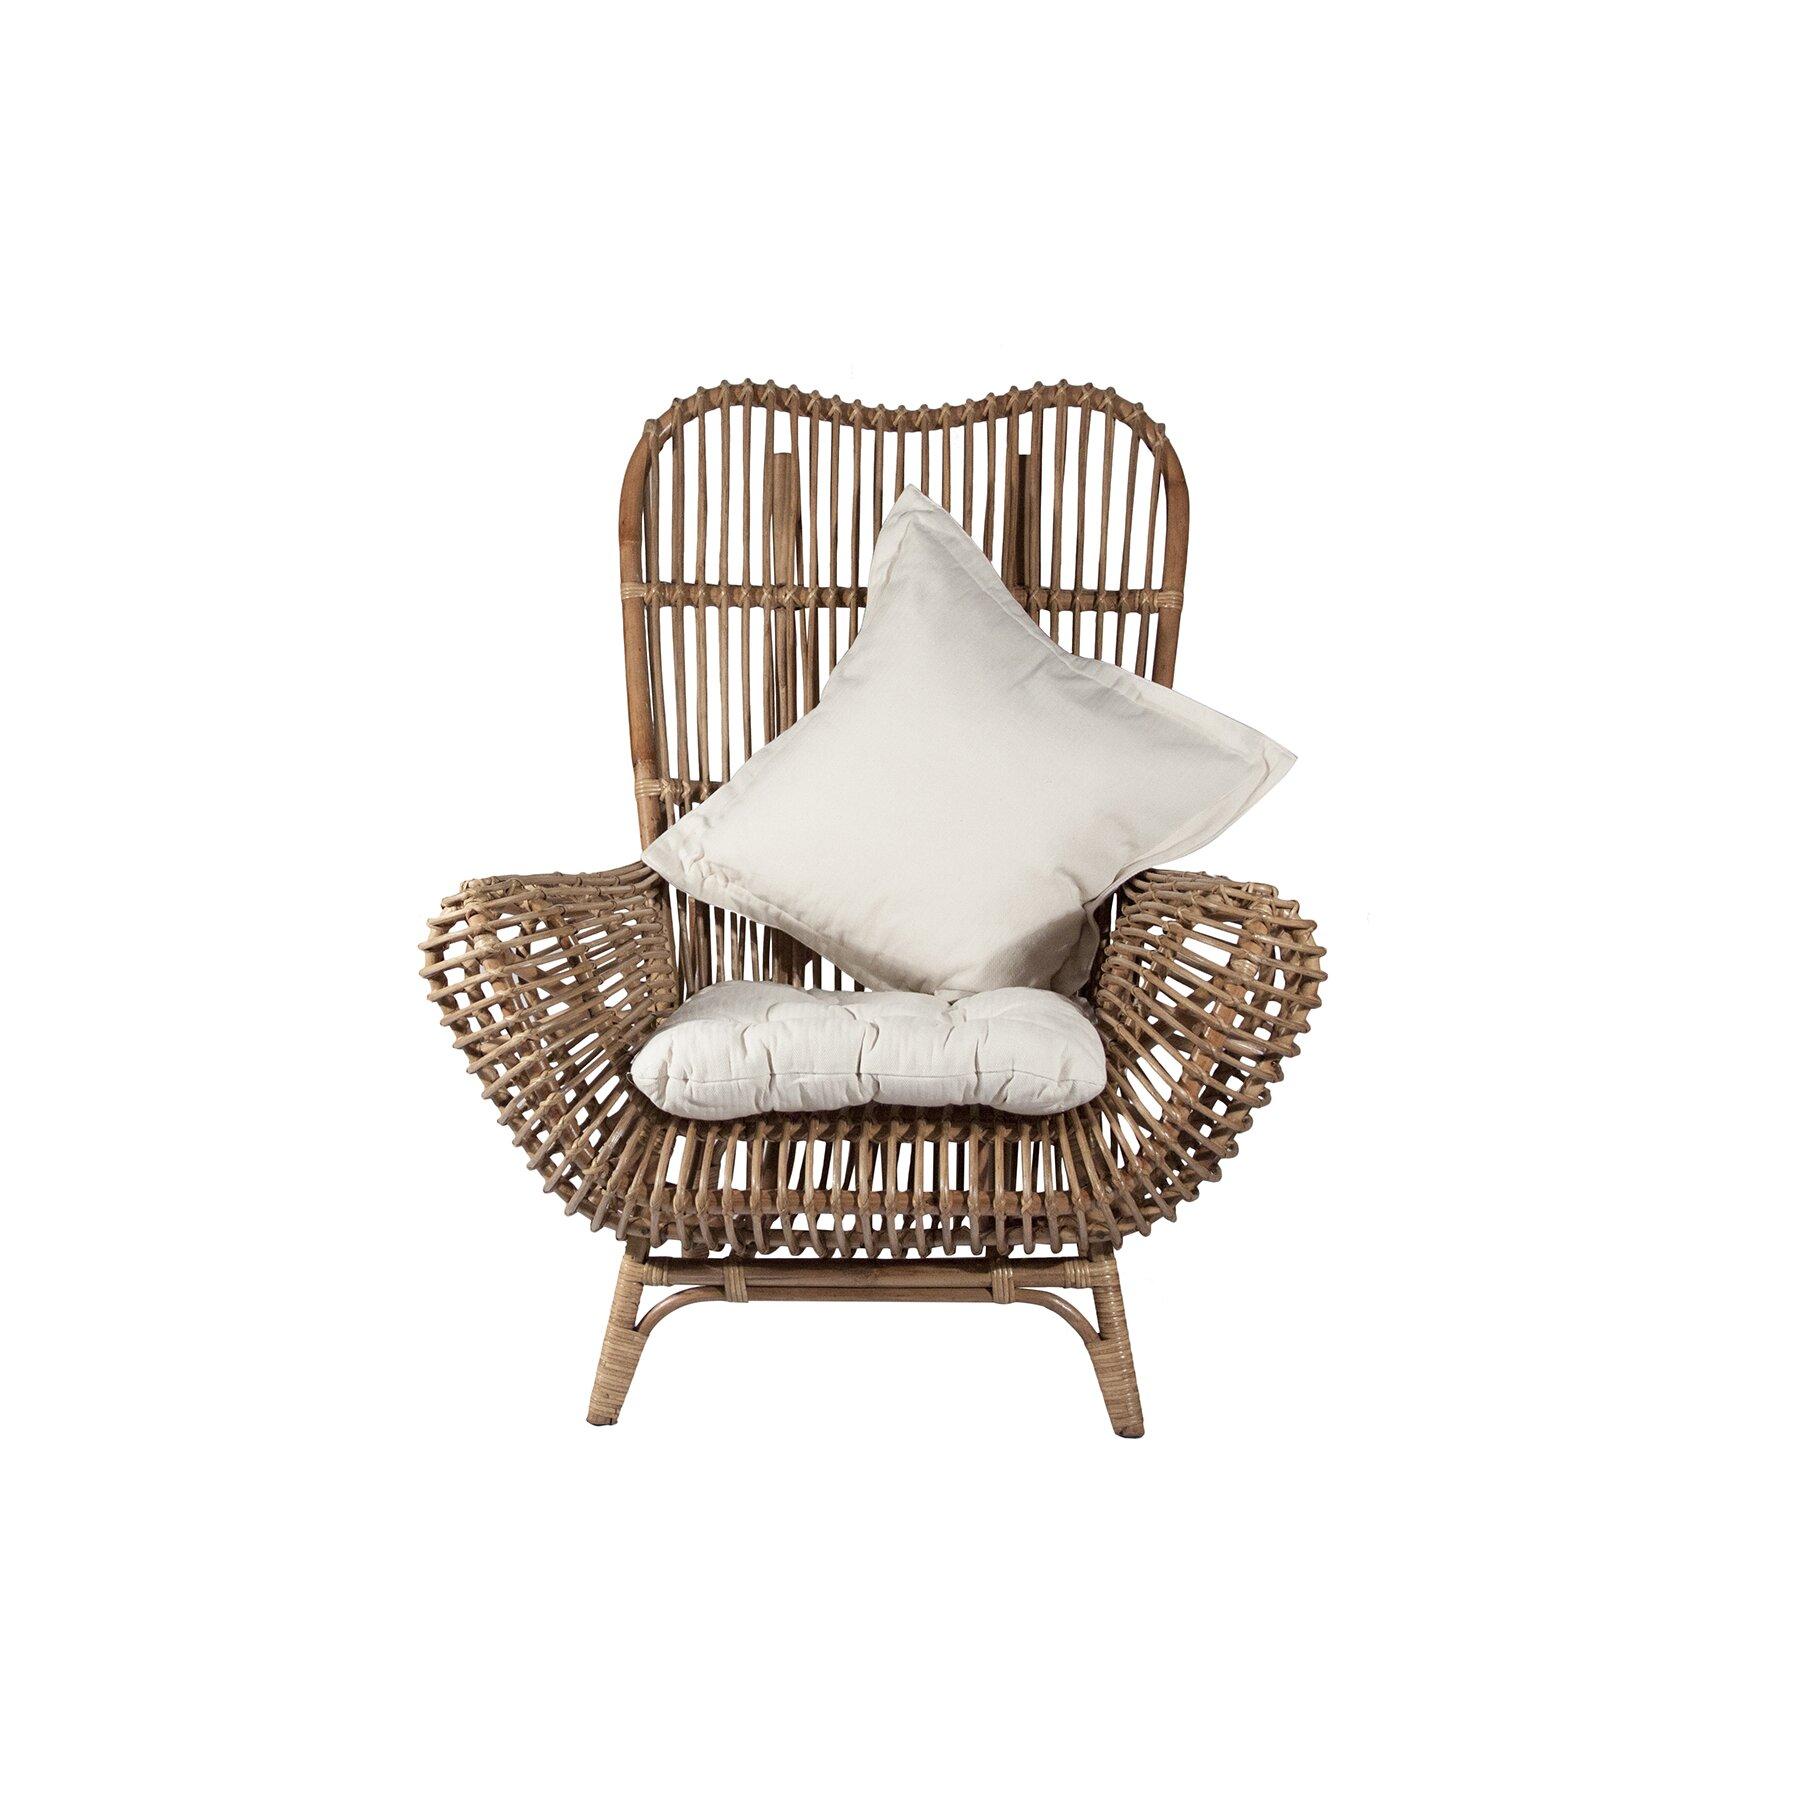 Wonderful Ringo Circular Rattan Chair · Https://secure.img2 Fg.wfcdn.com/im/